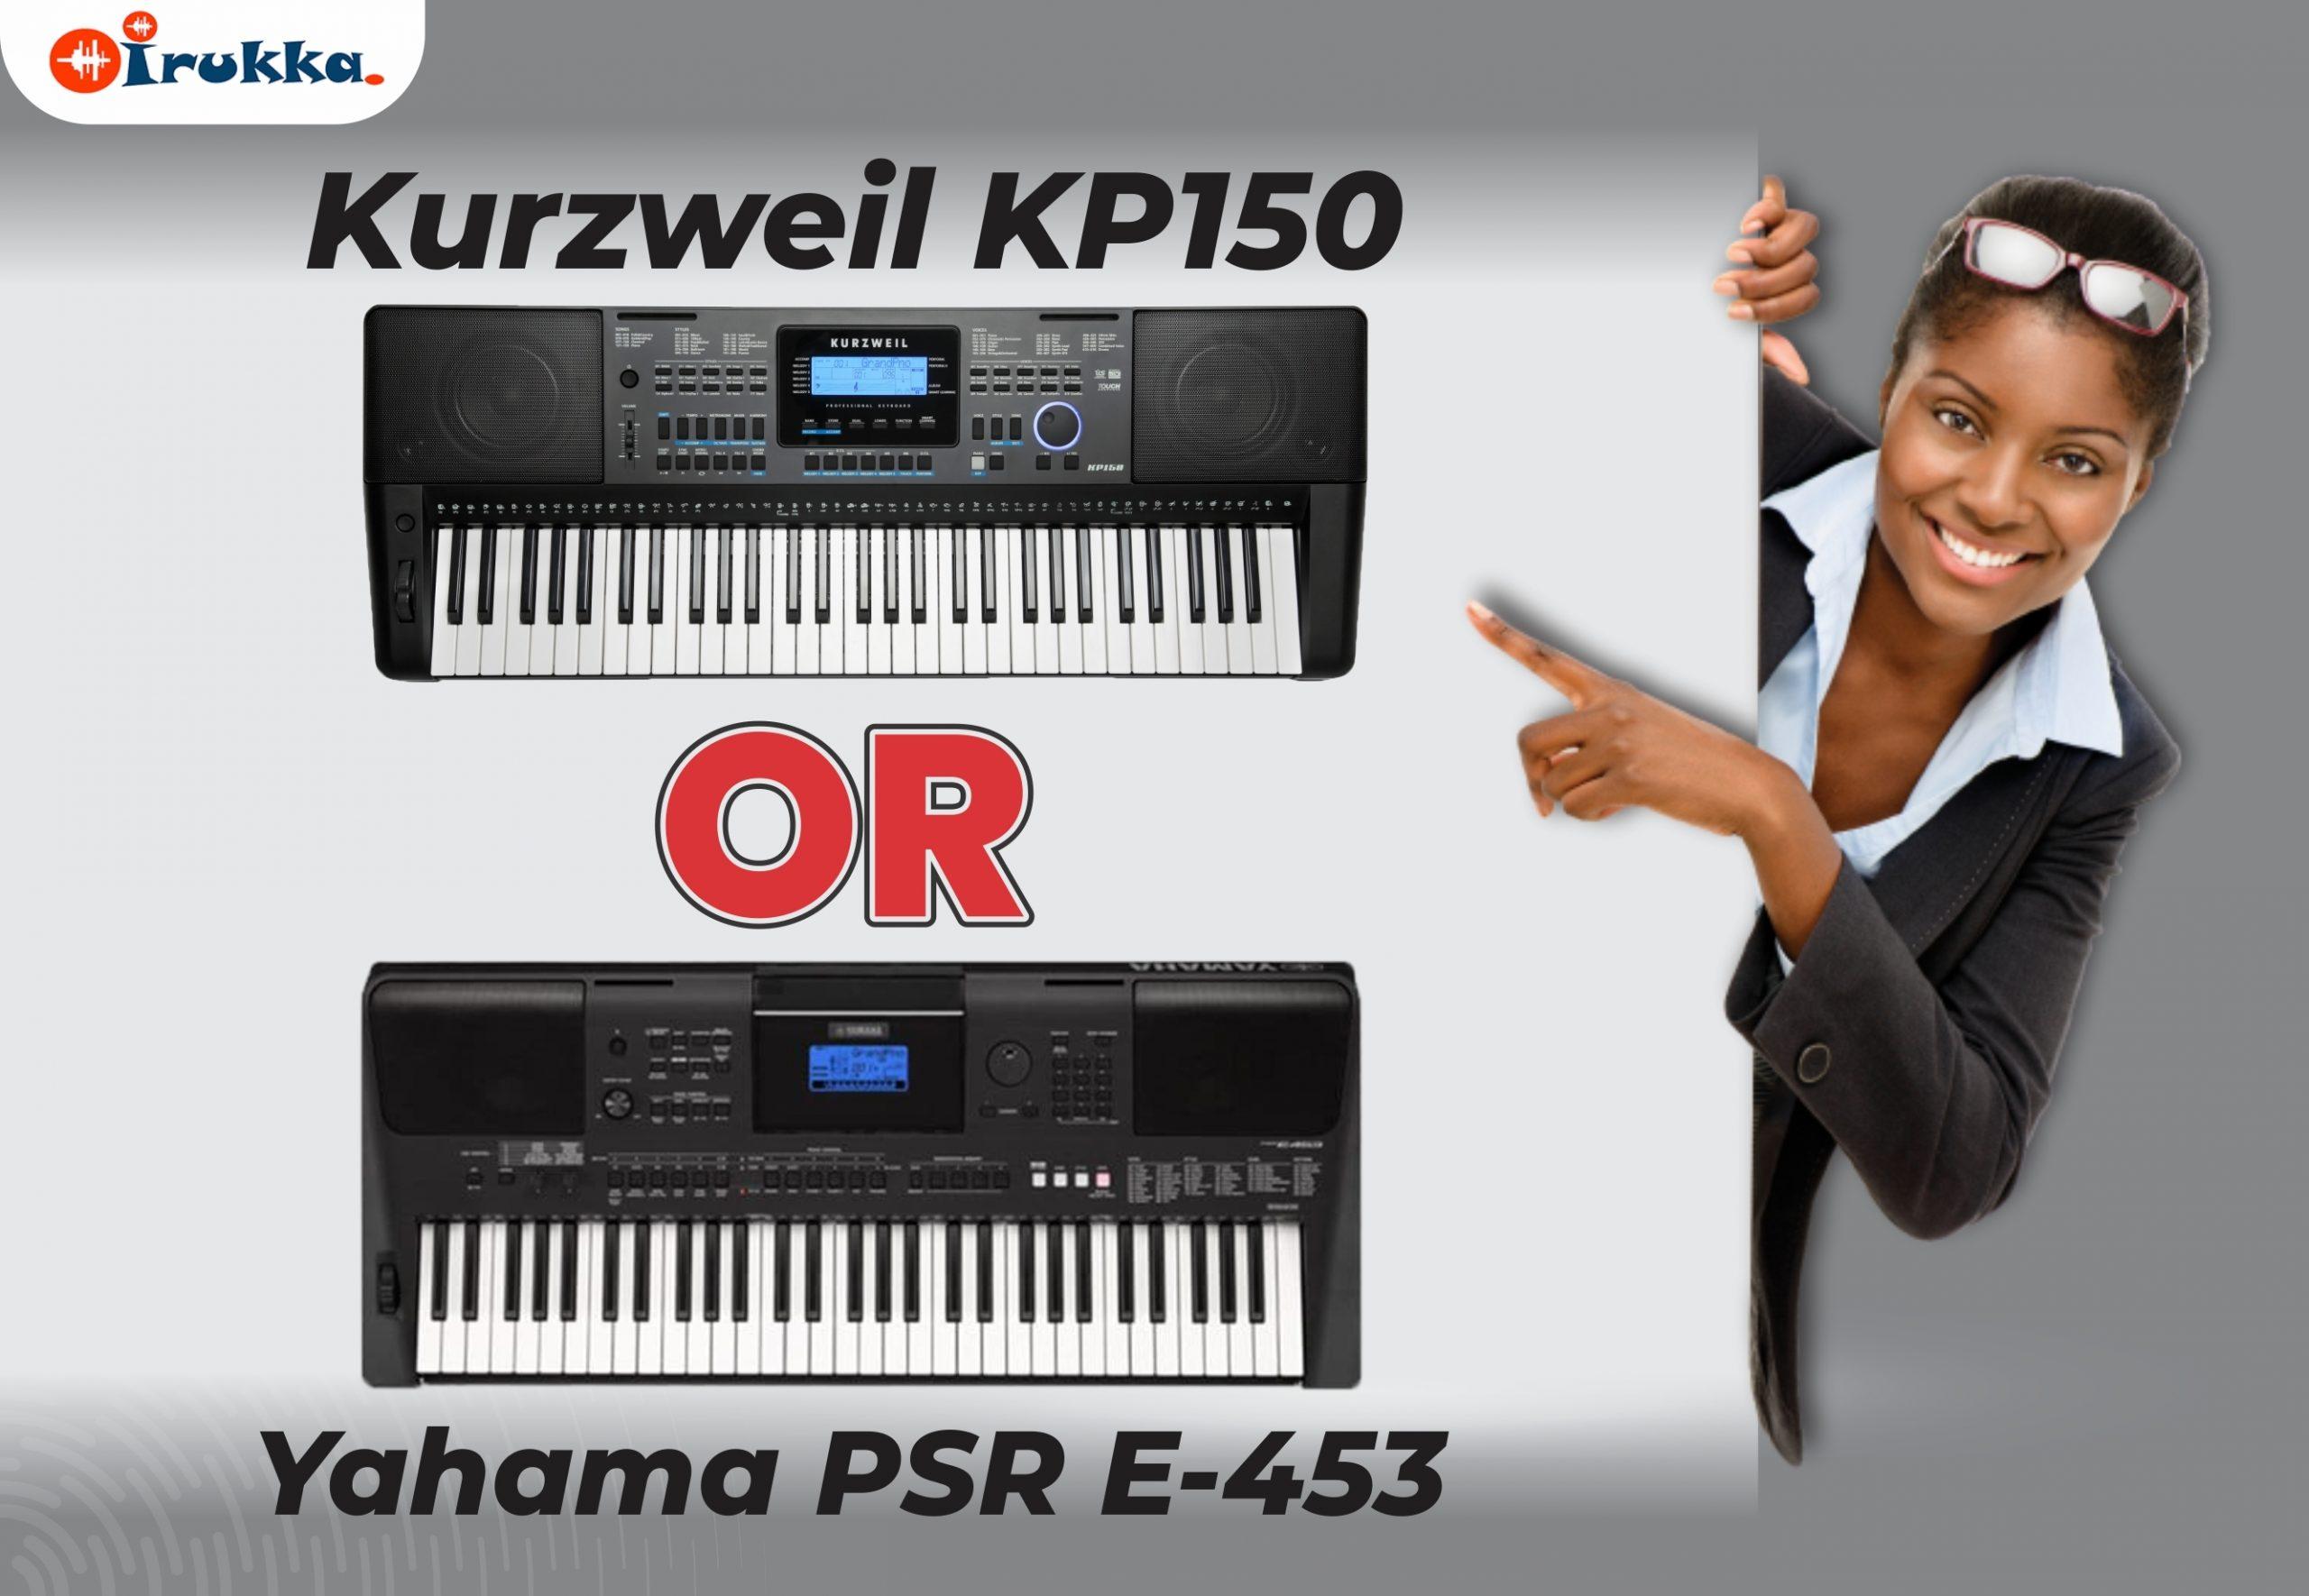 Kurzweil KP 150 VS Yahama PSR E-453